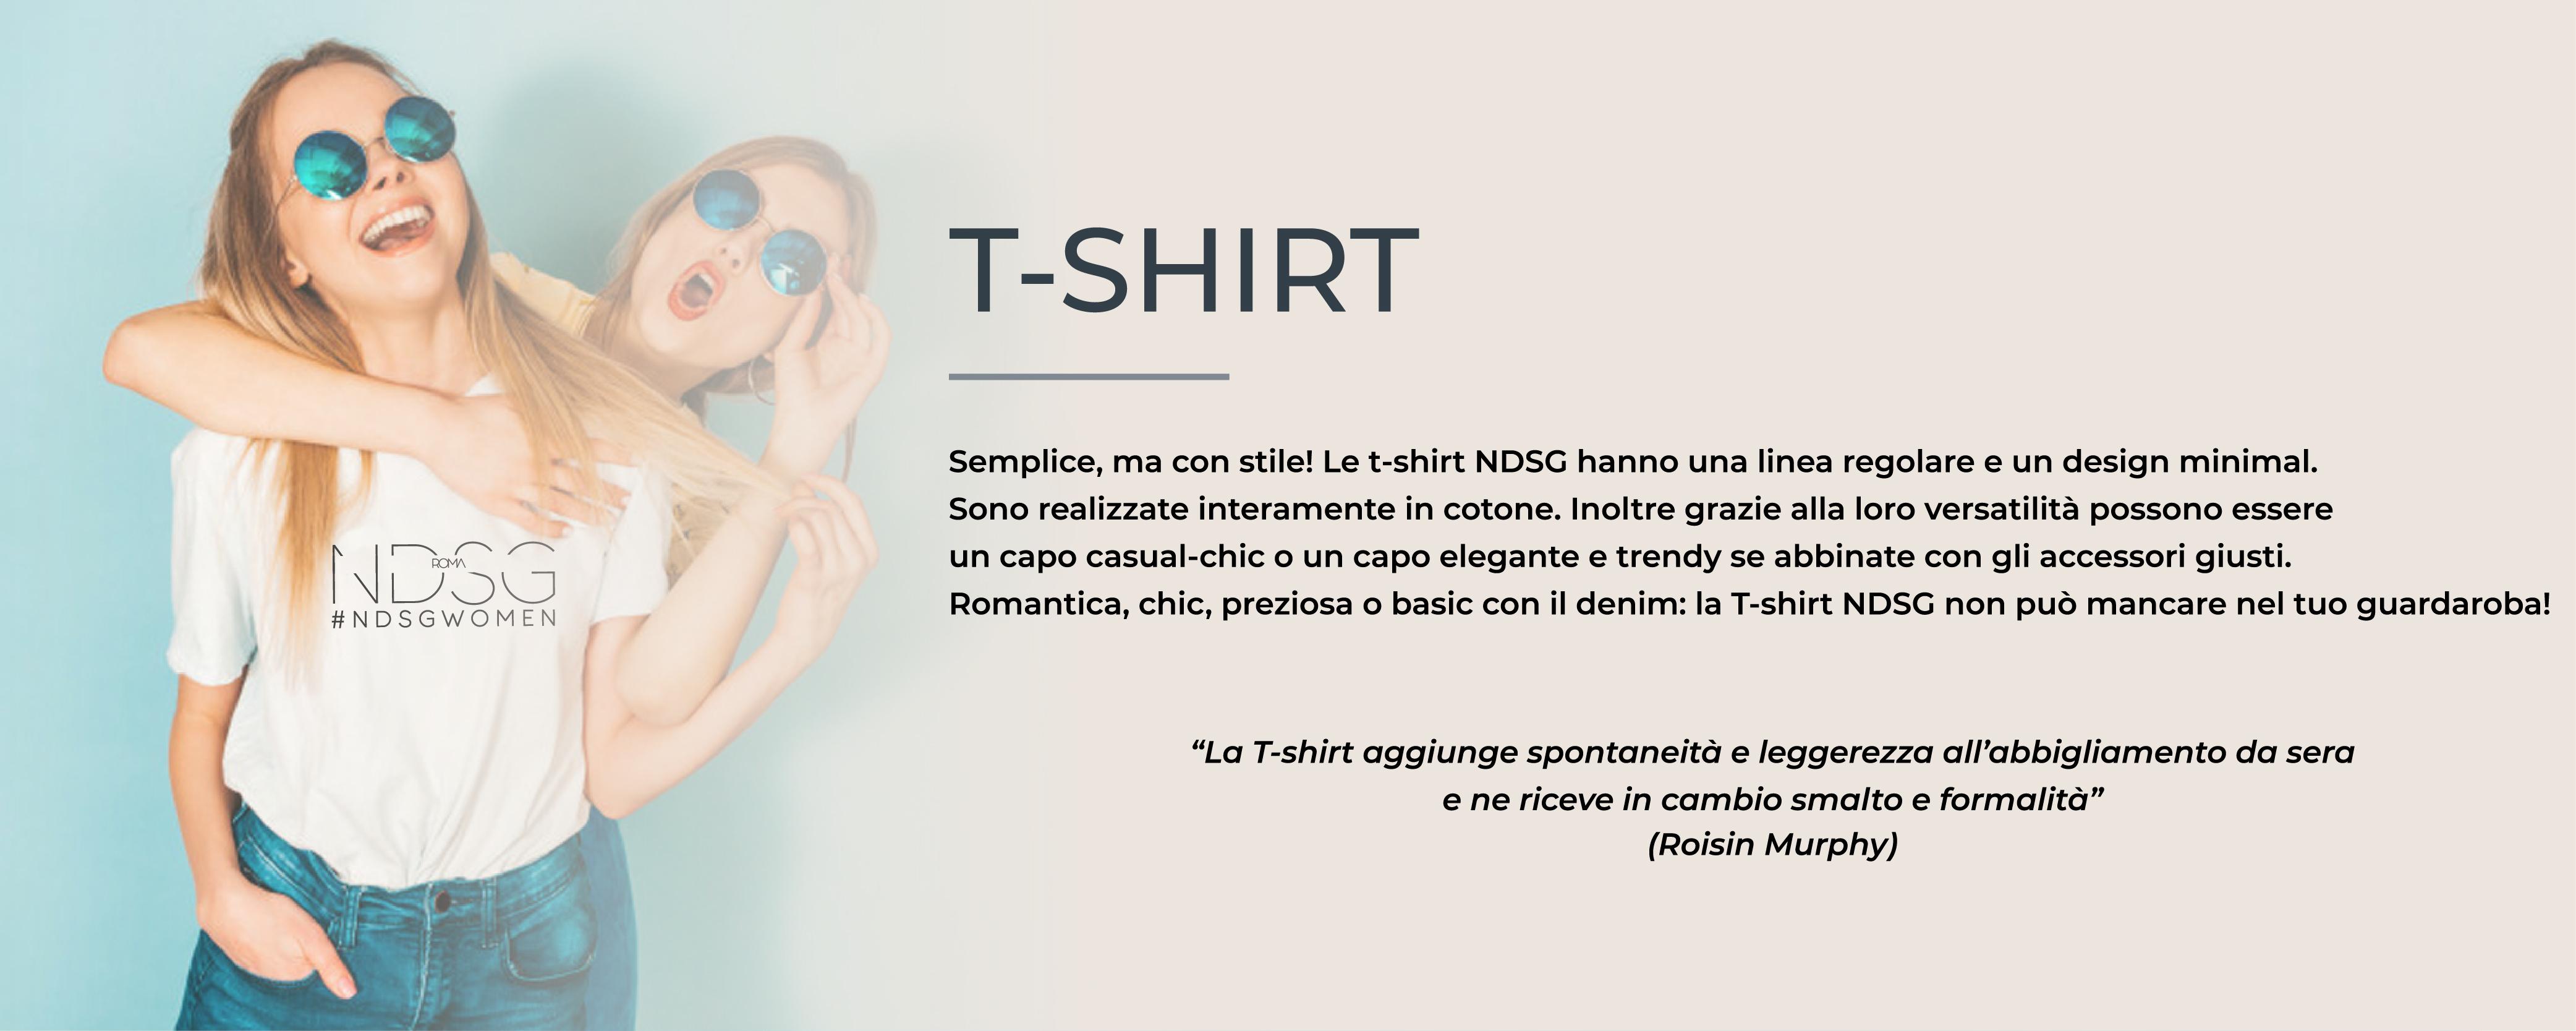 T-SHIRT2-01.jpg